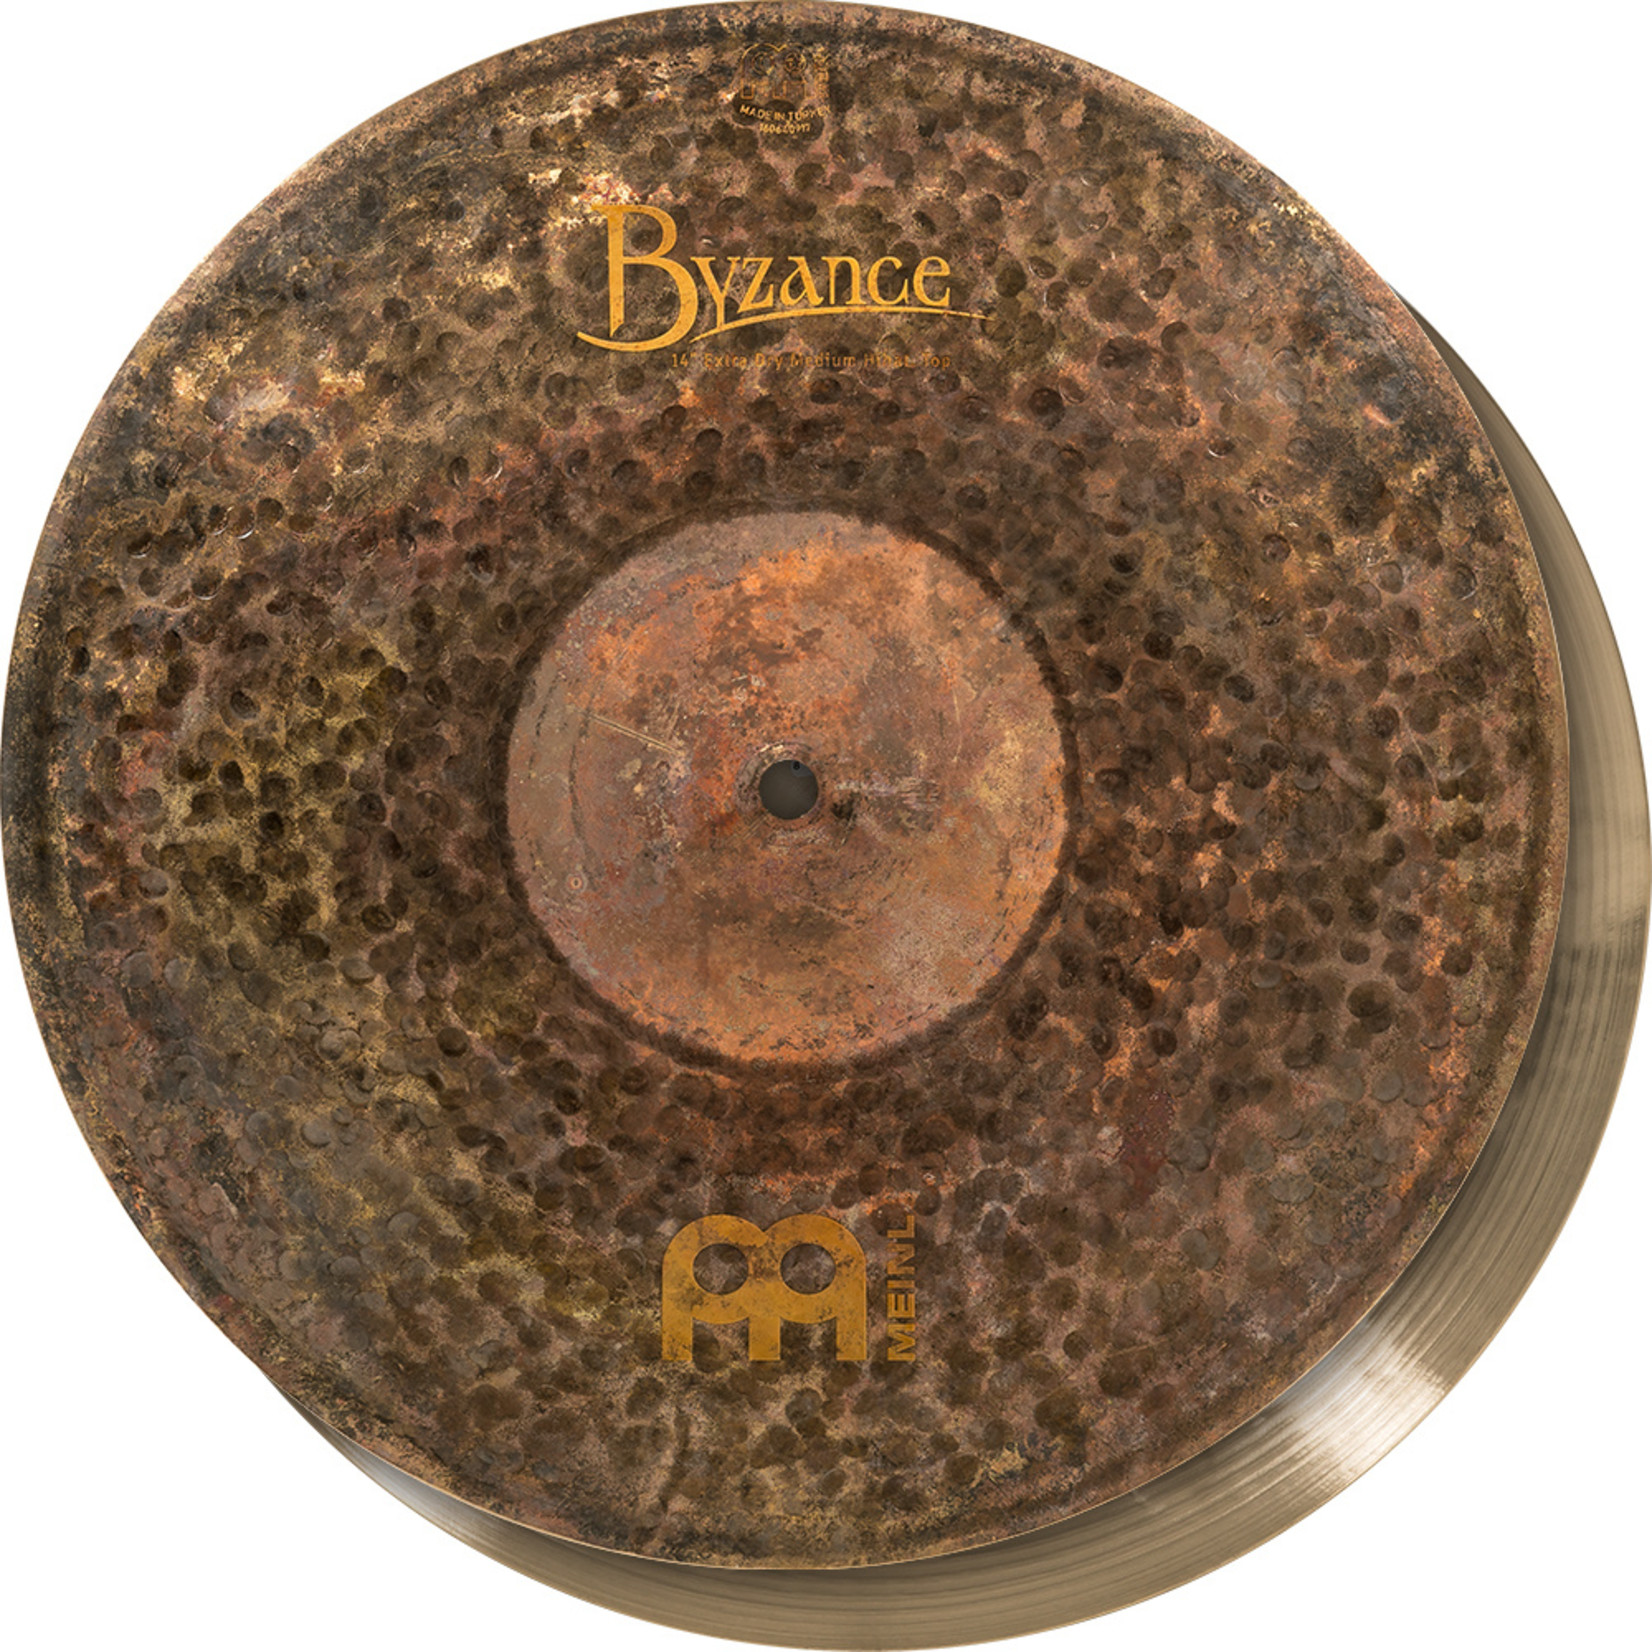 Meinl Meinl Byzance 14''  Extra Dry Medium, Hihat, pair